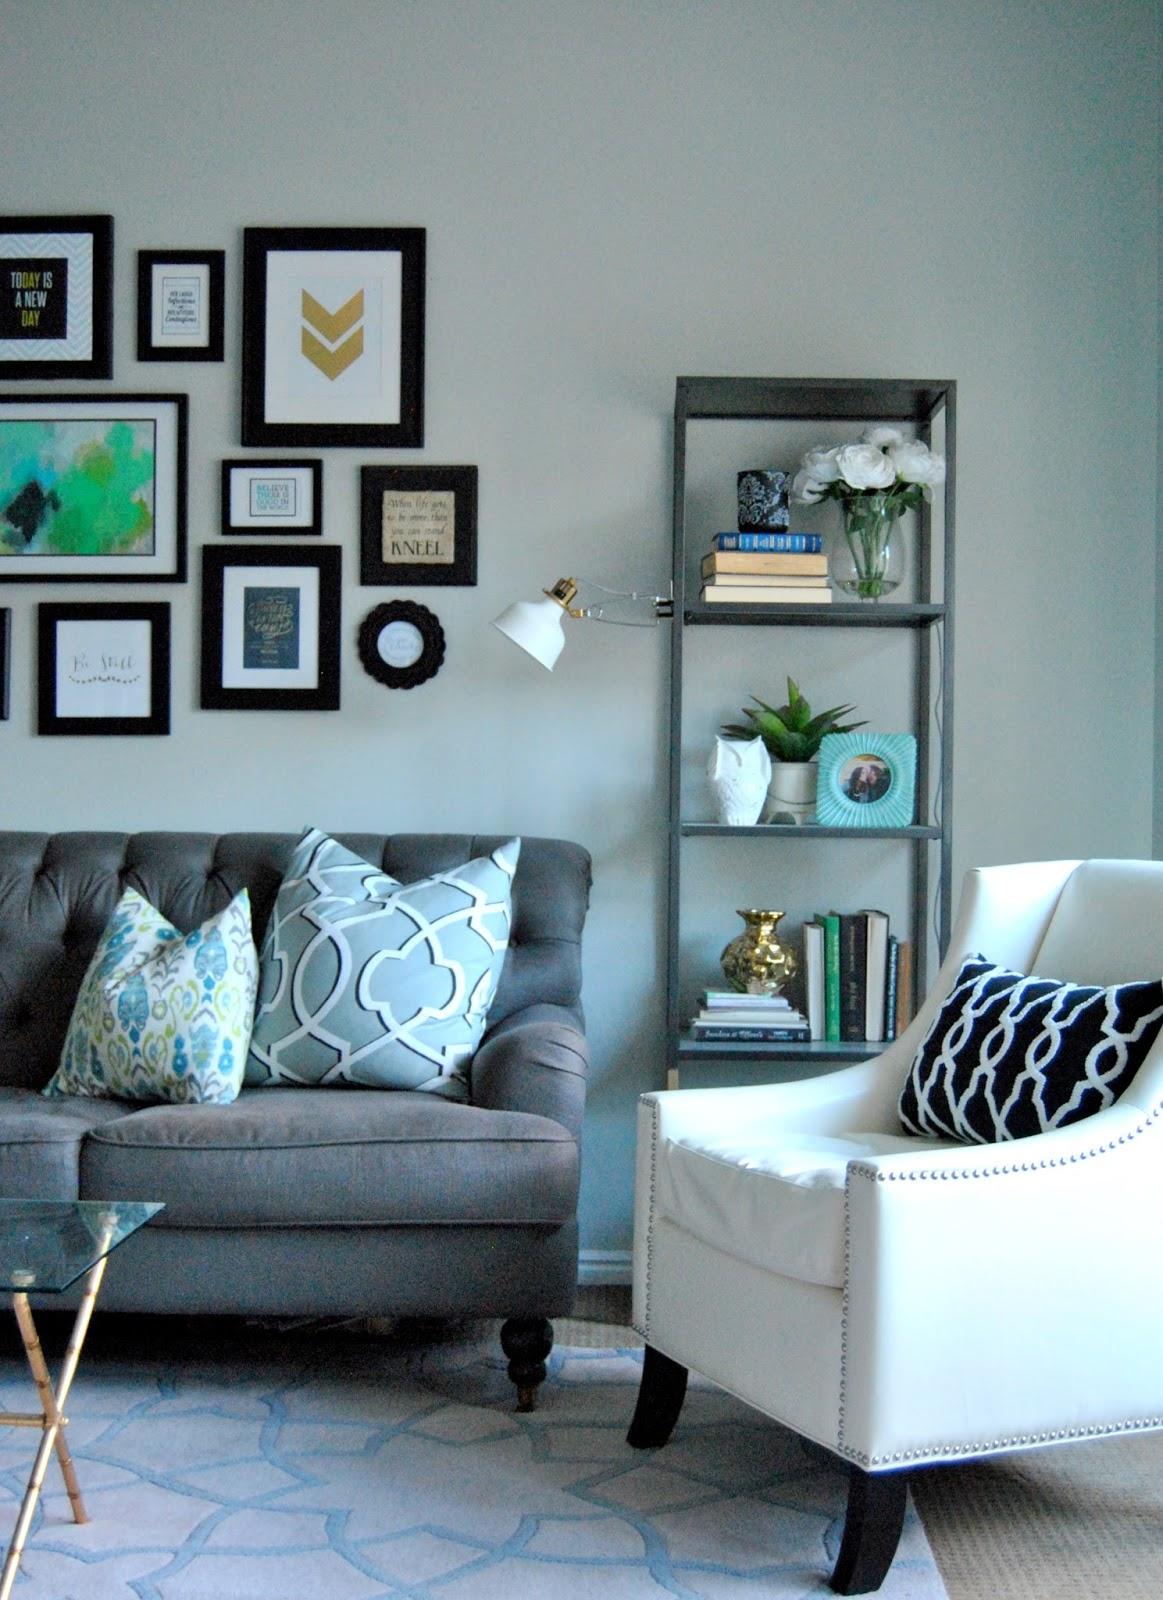 dark teal accent chair swing stand diy studio 7 interior design: black + white faves list